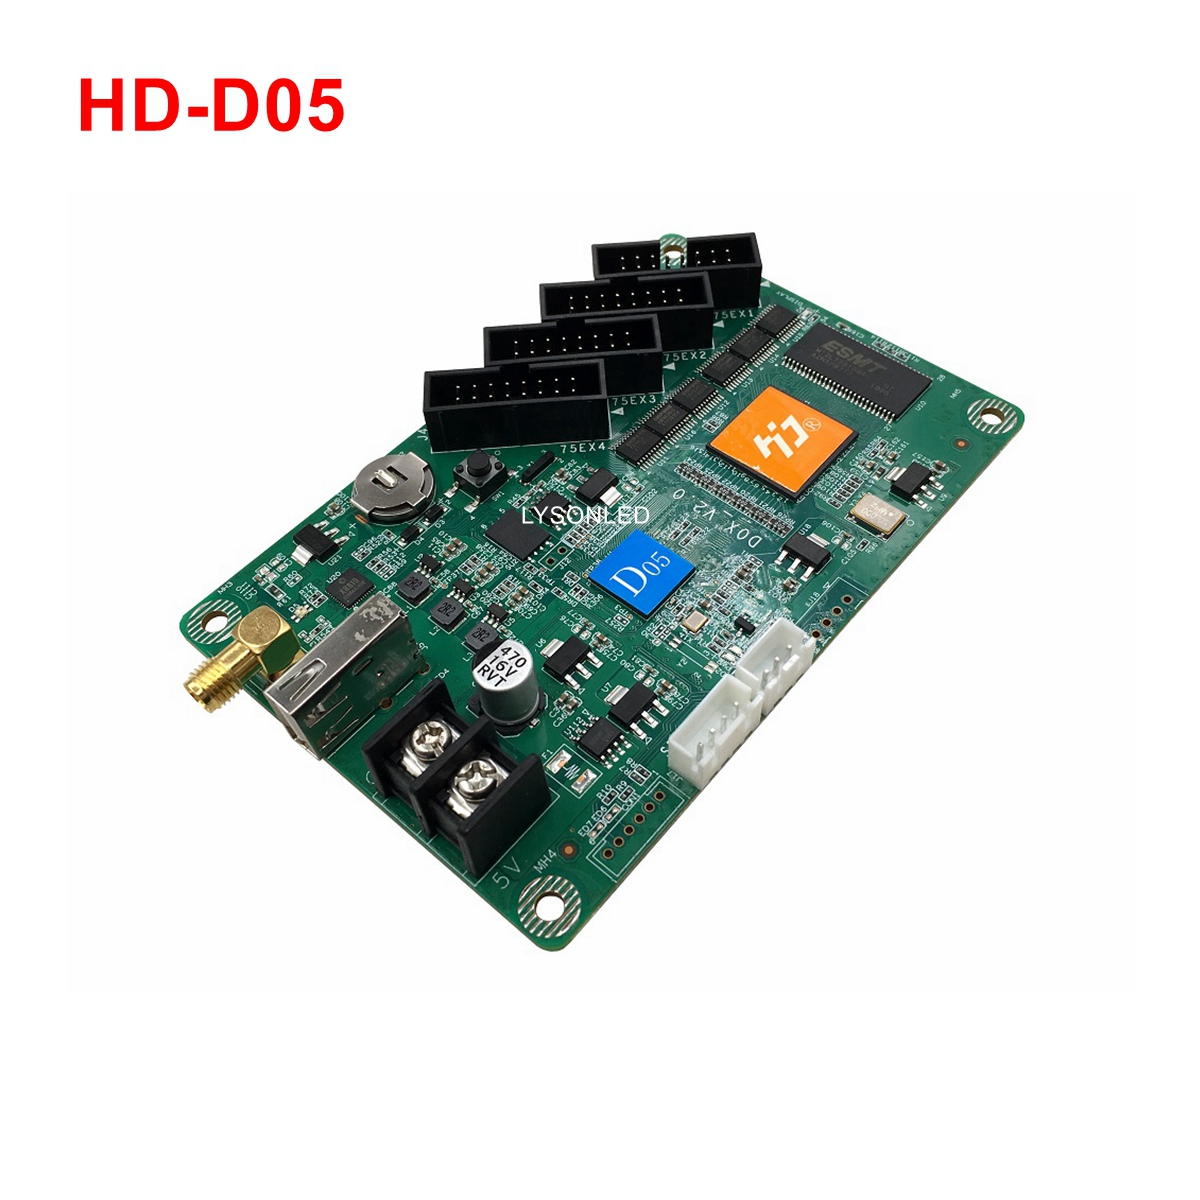 Huidu HD-D05 WiFi Full Color Control Card For Small Door Signboard Screens Wireless Controller